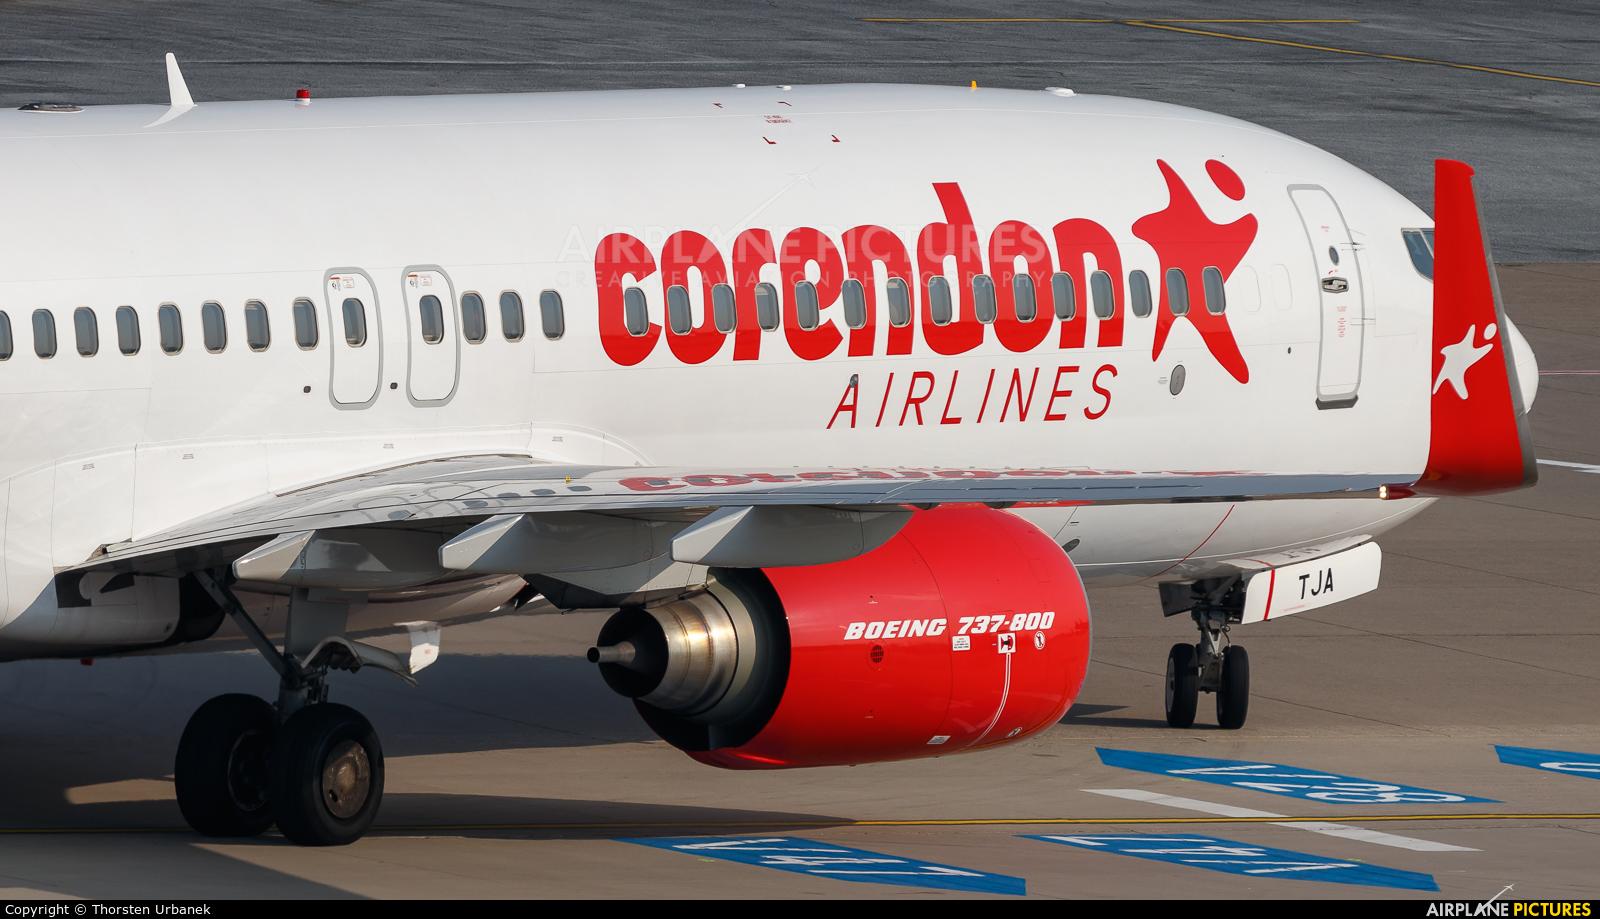 Corendon Airlines 9H-TJA aircraft at Düsseldorf